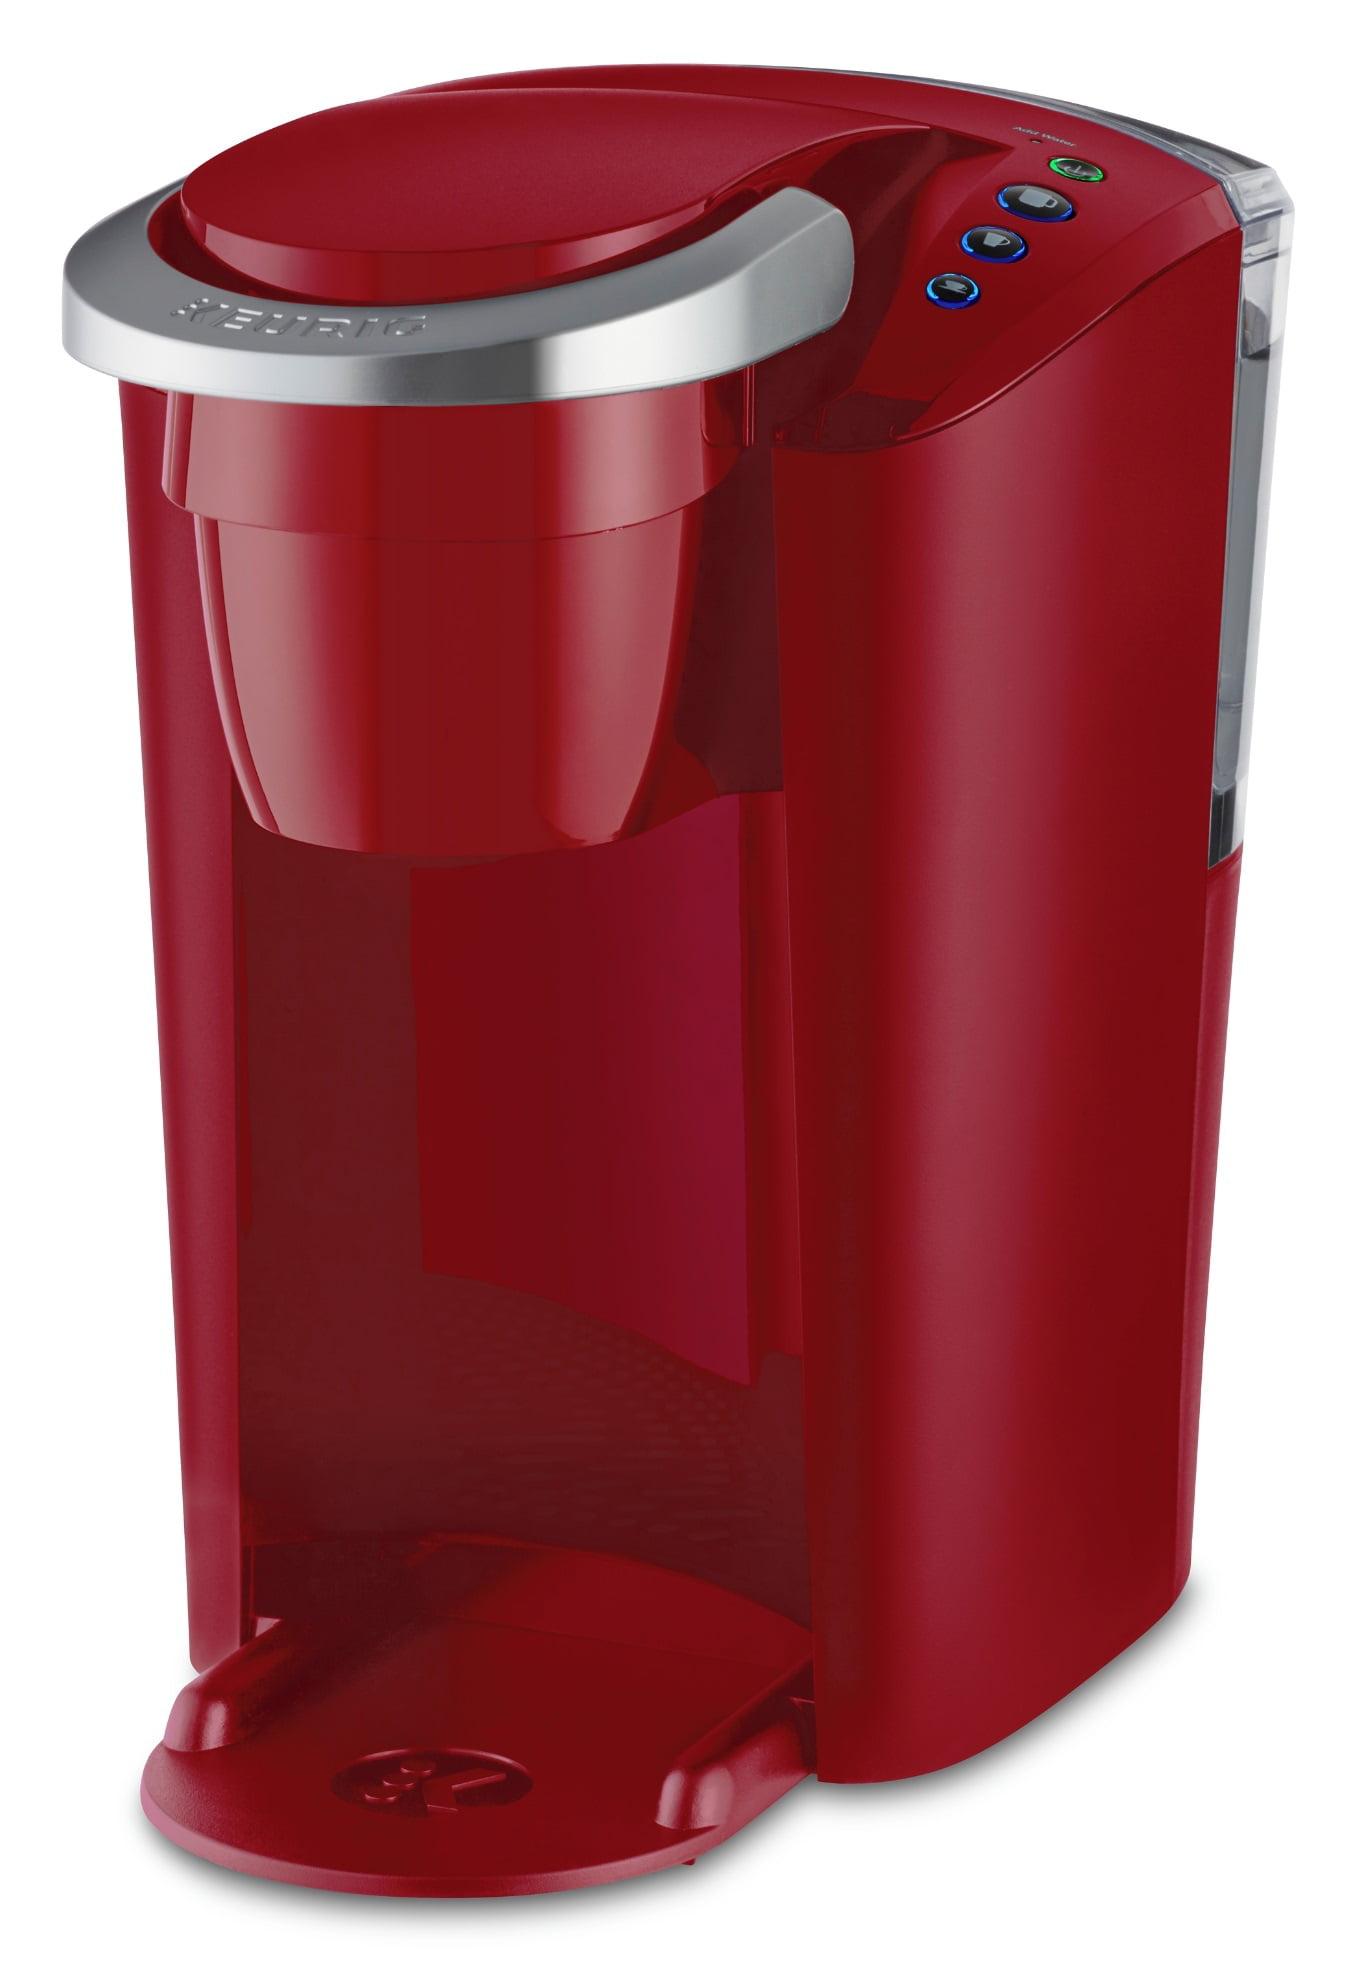 Keurig K Compact Single Serve Red Coffee Maker 125 K Cup Brewer